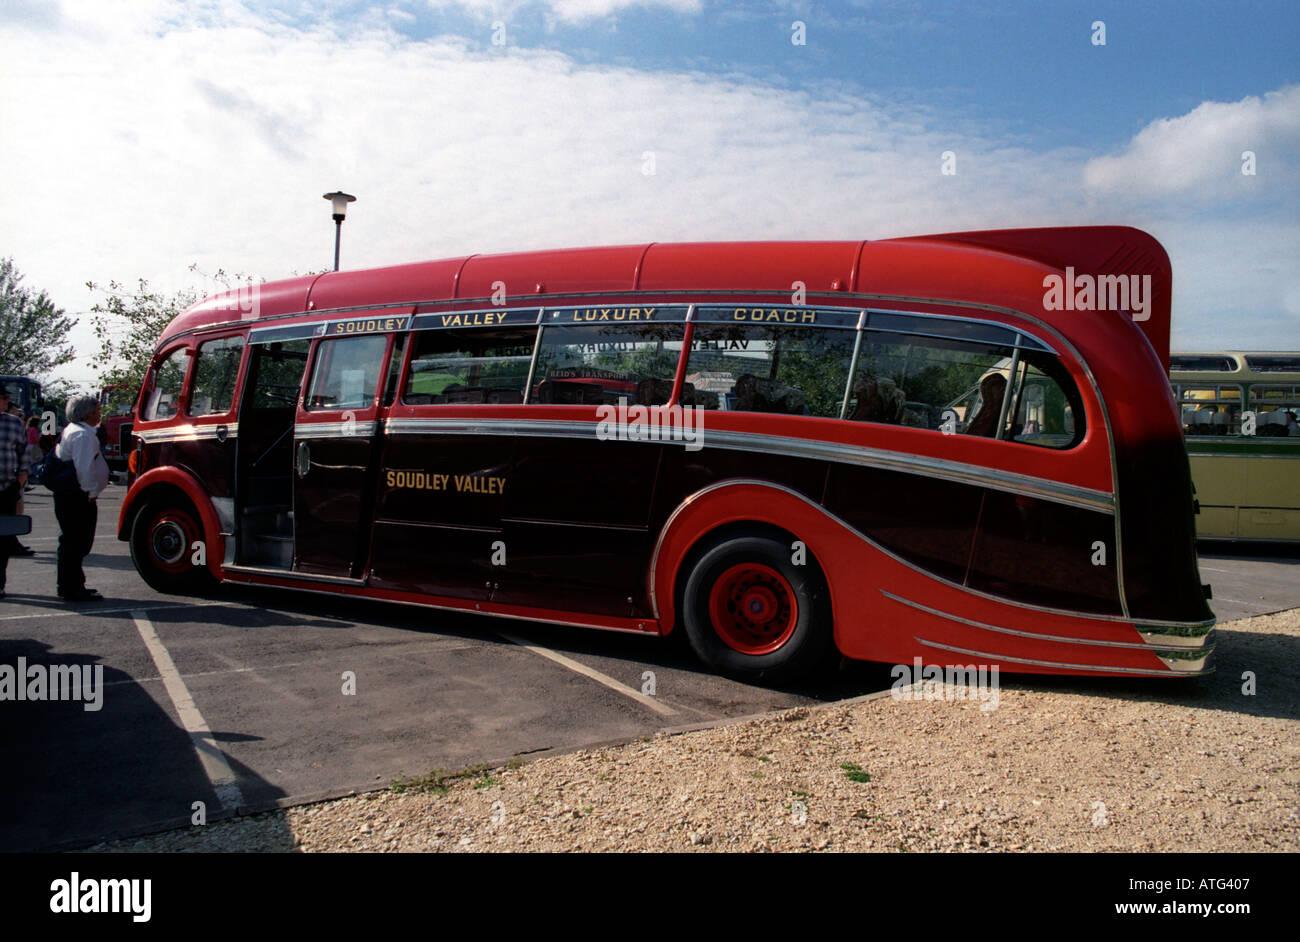 Vintage Buses Coaches Stock Photos & Vintage Buses Coaches Stock